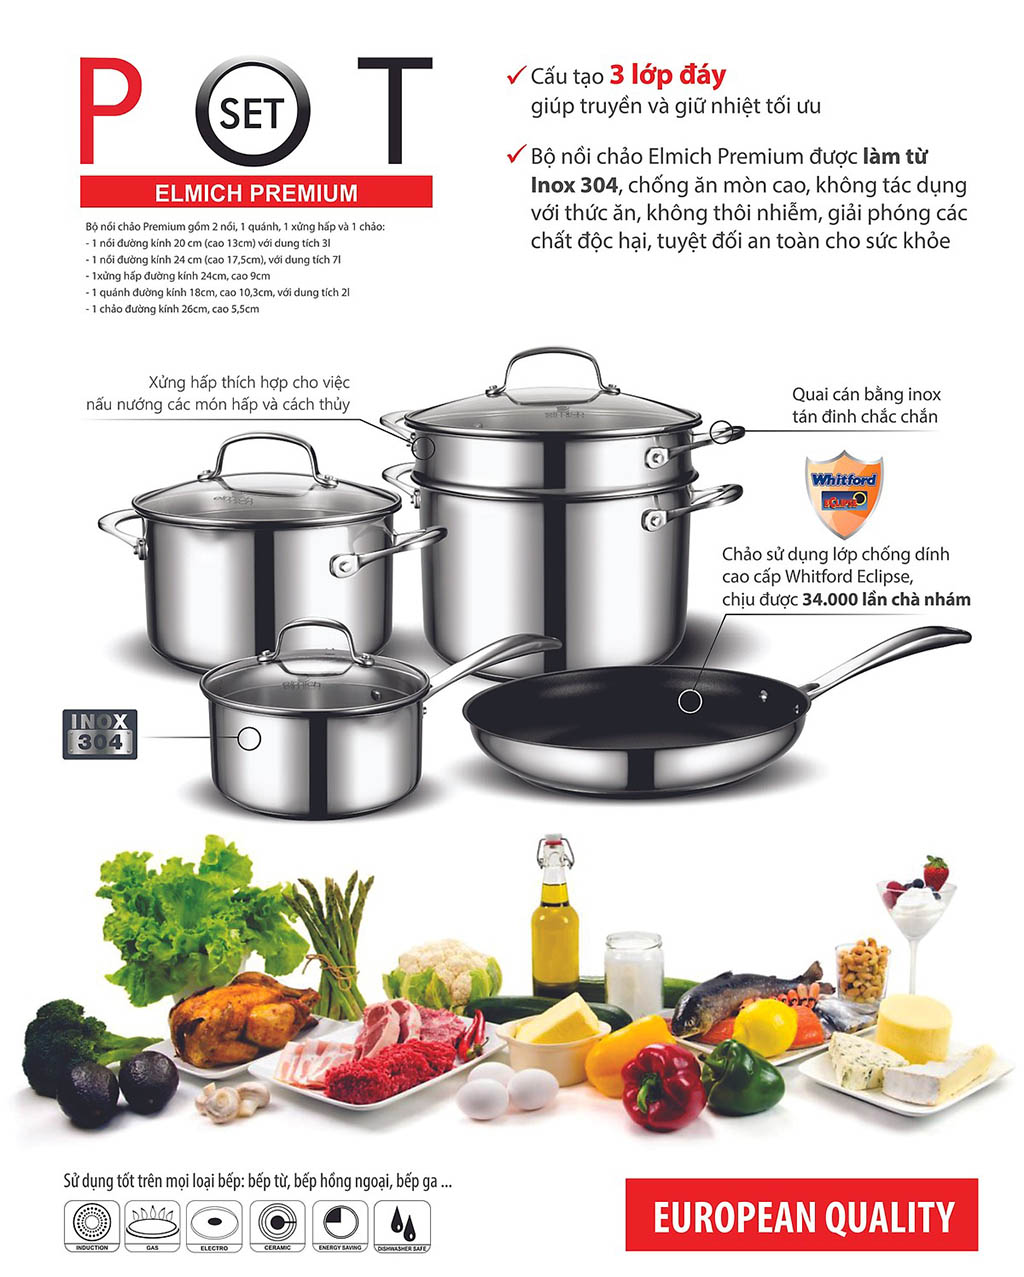 Bộ Nồi và chảo cáo cấp Inox 304 Elmich Premium EL3134 dùng bếp từ